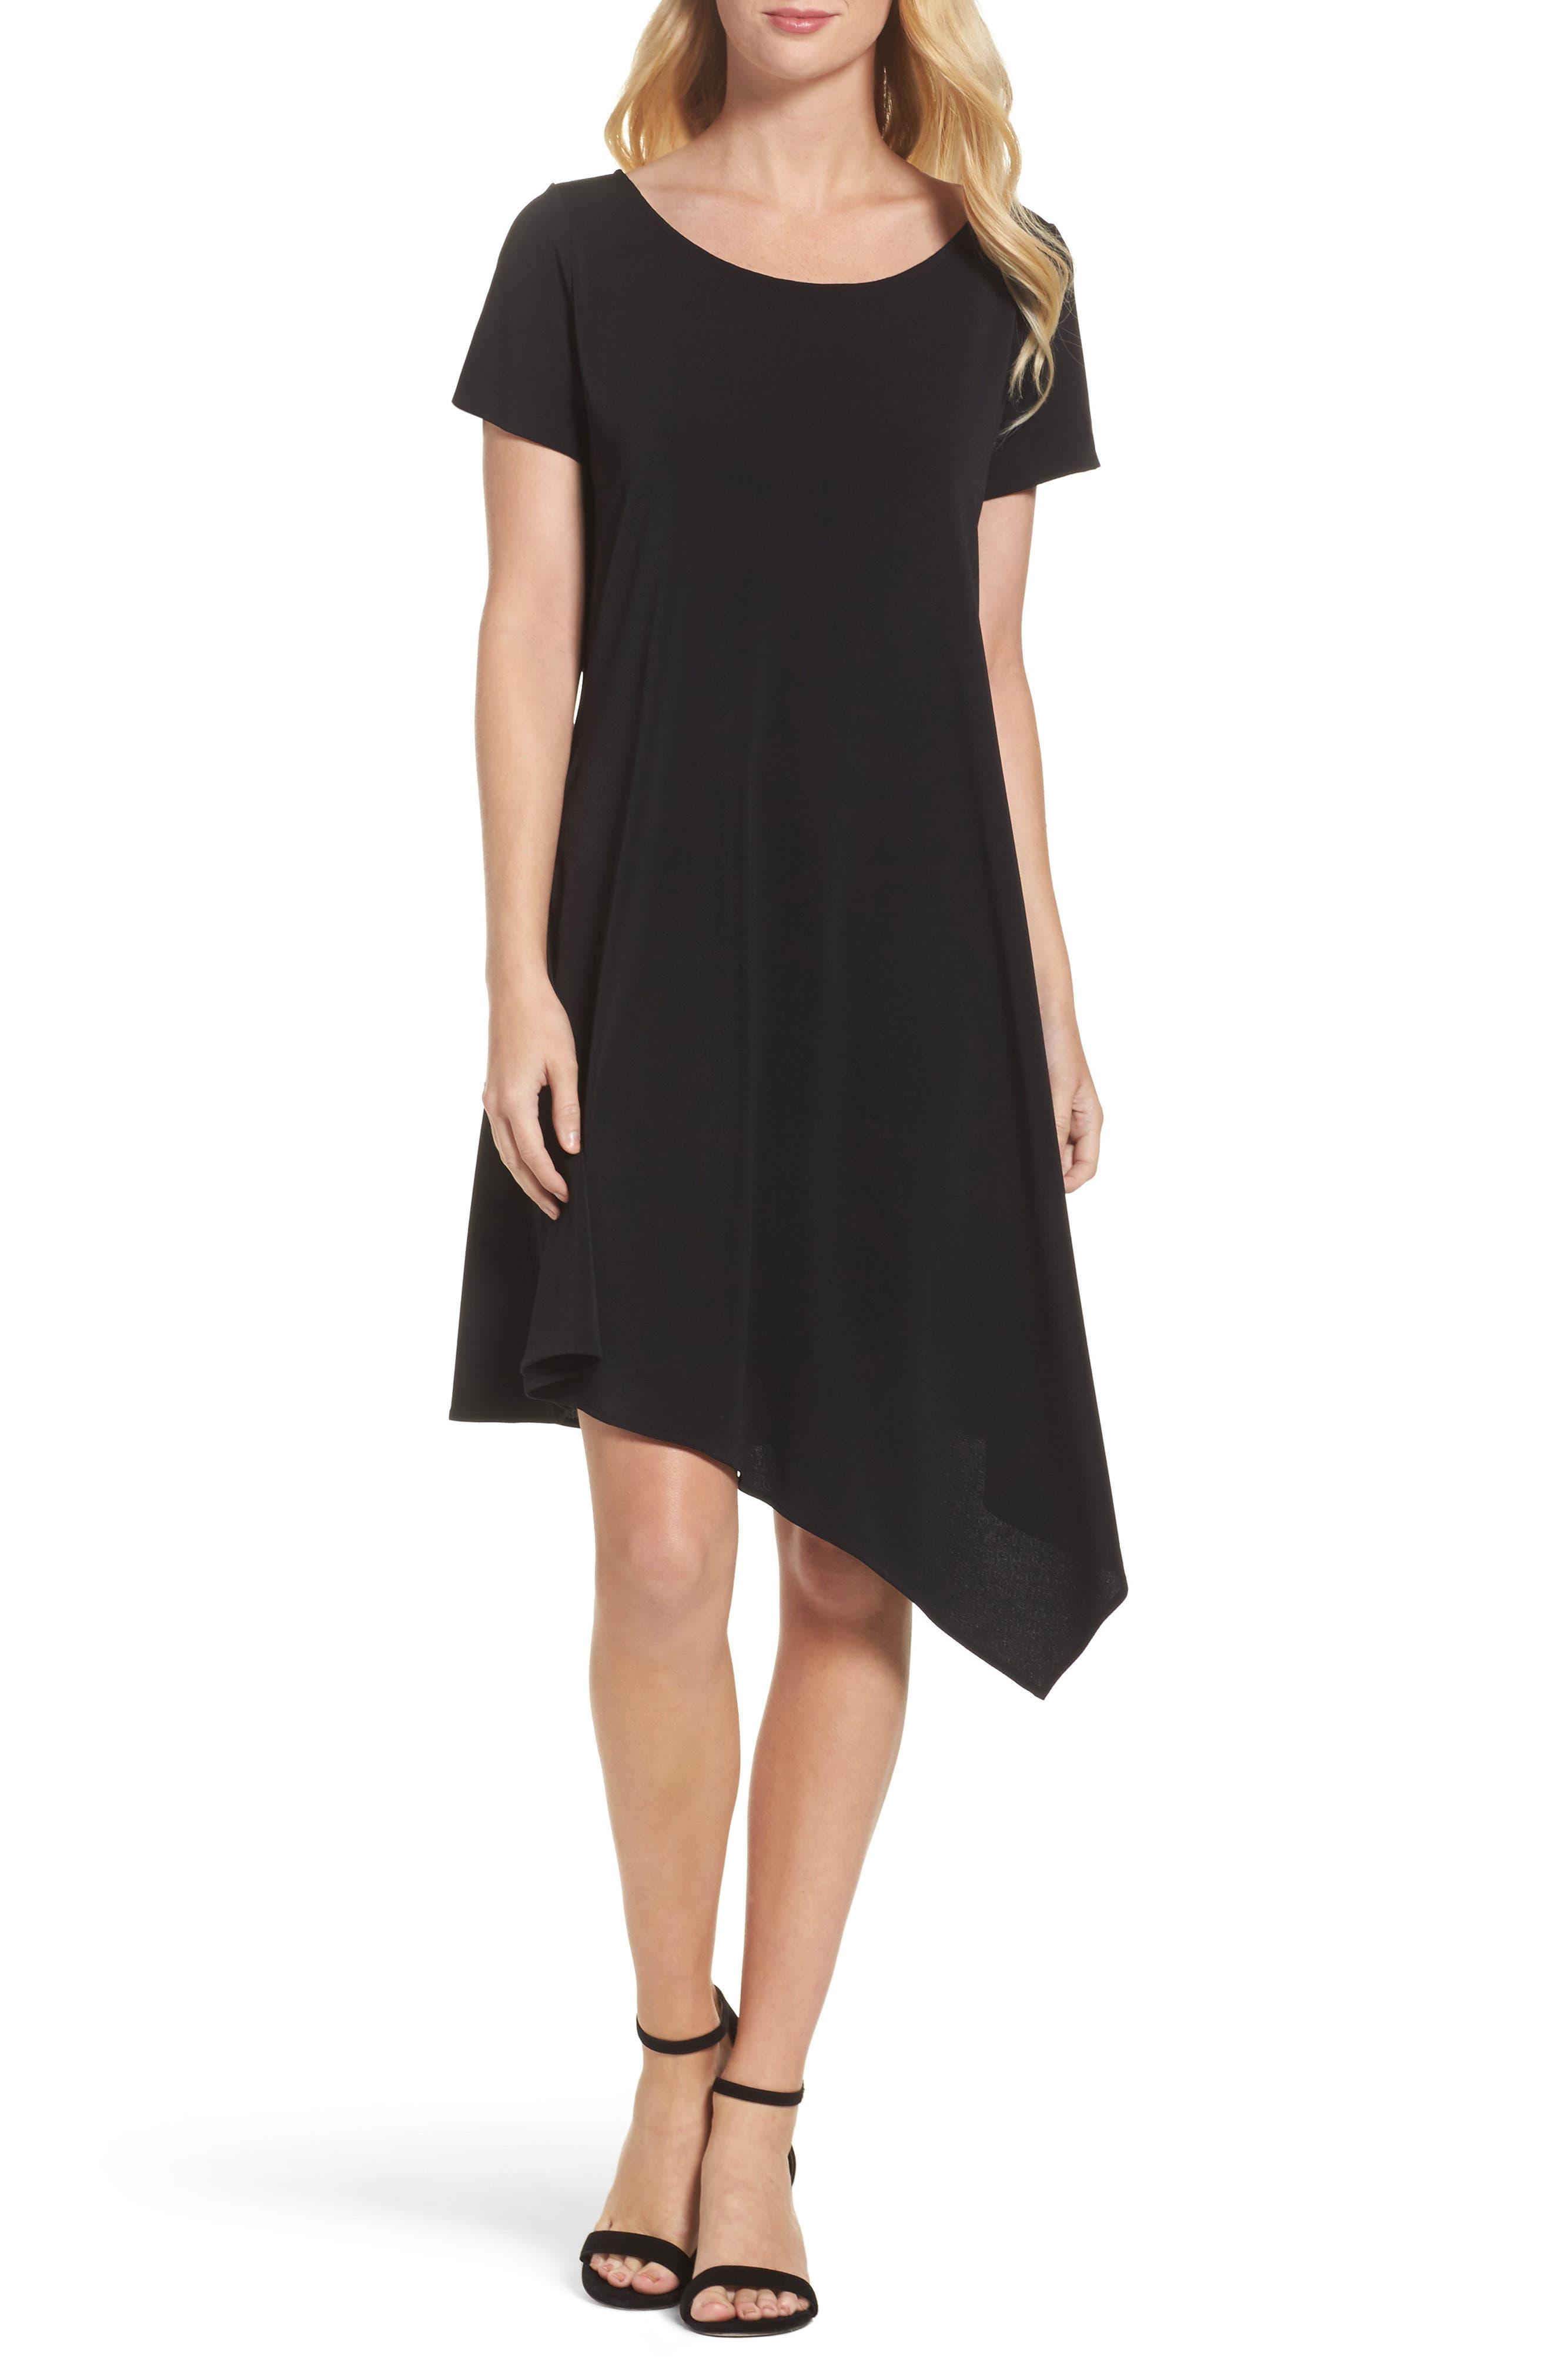 Leota Darien Asymmetrical Dress